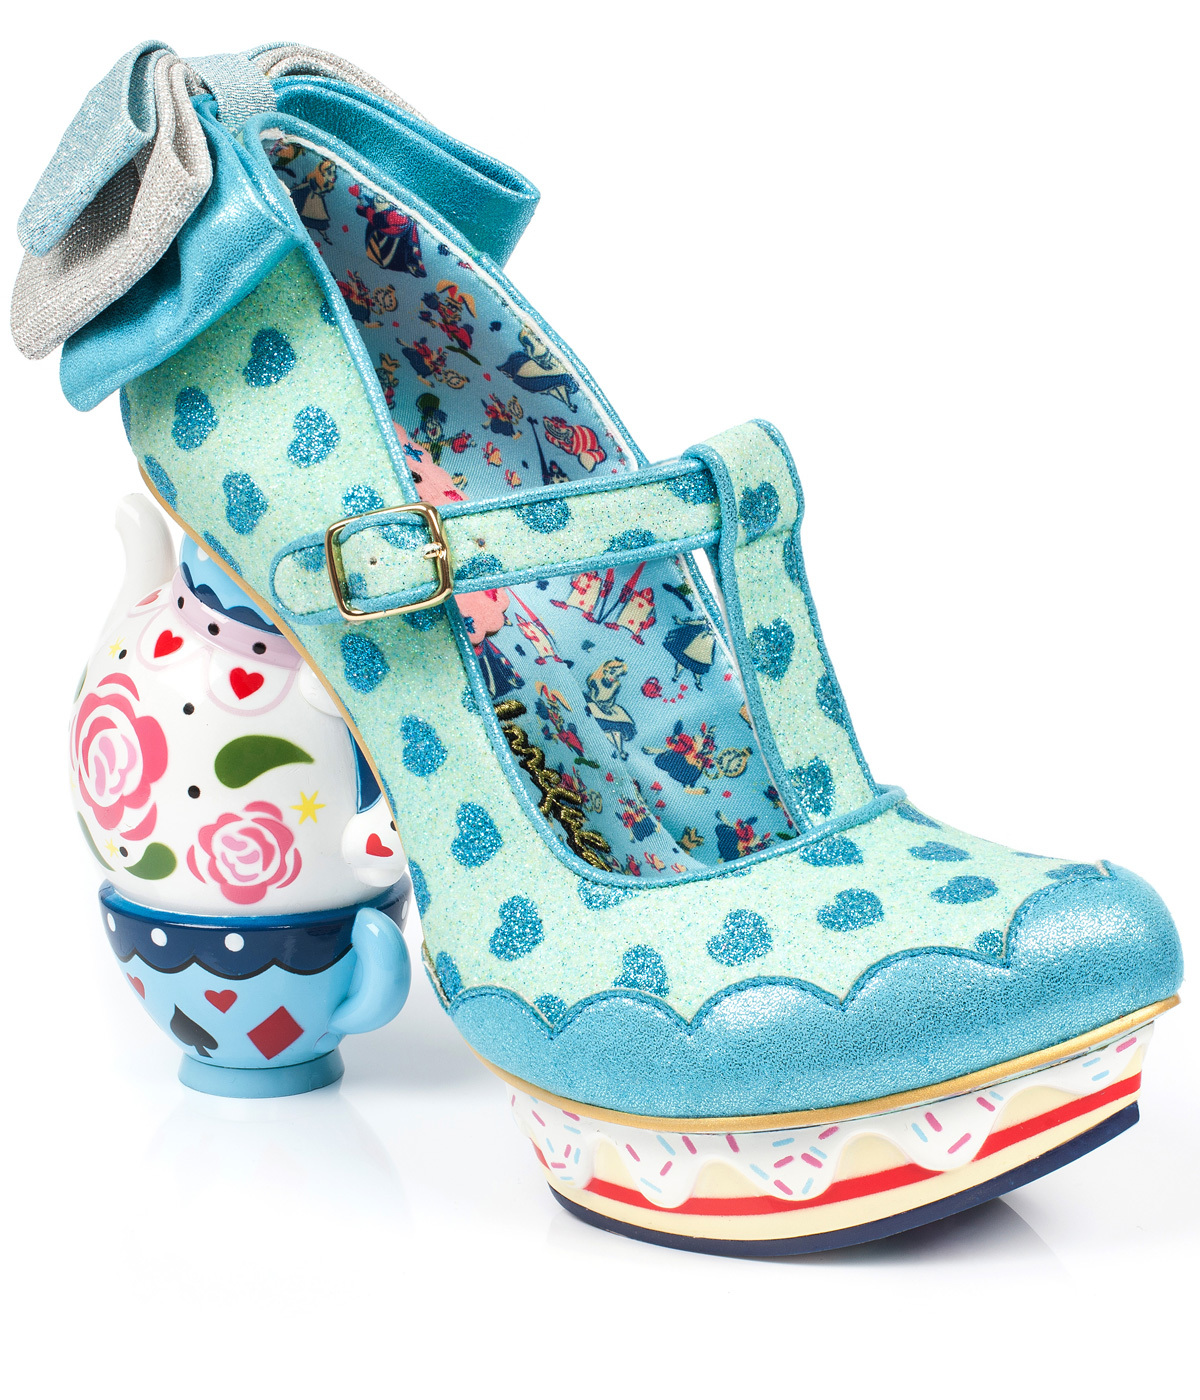 02a20463faeb IRREGULAR CHOICE My Cup Of Tea Alice in Wonderland Heels Blue